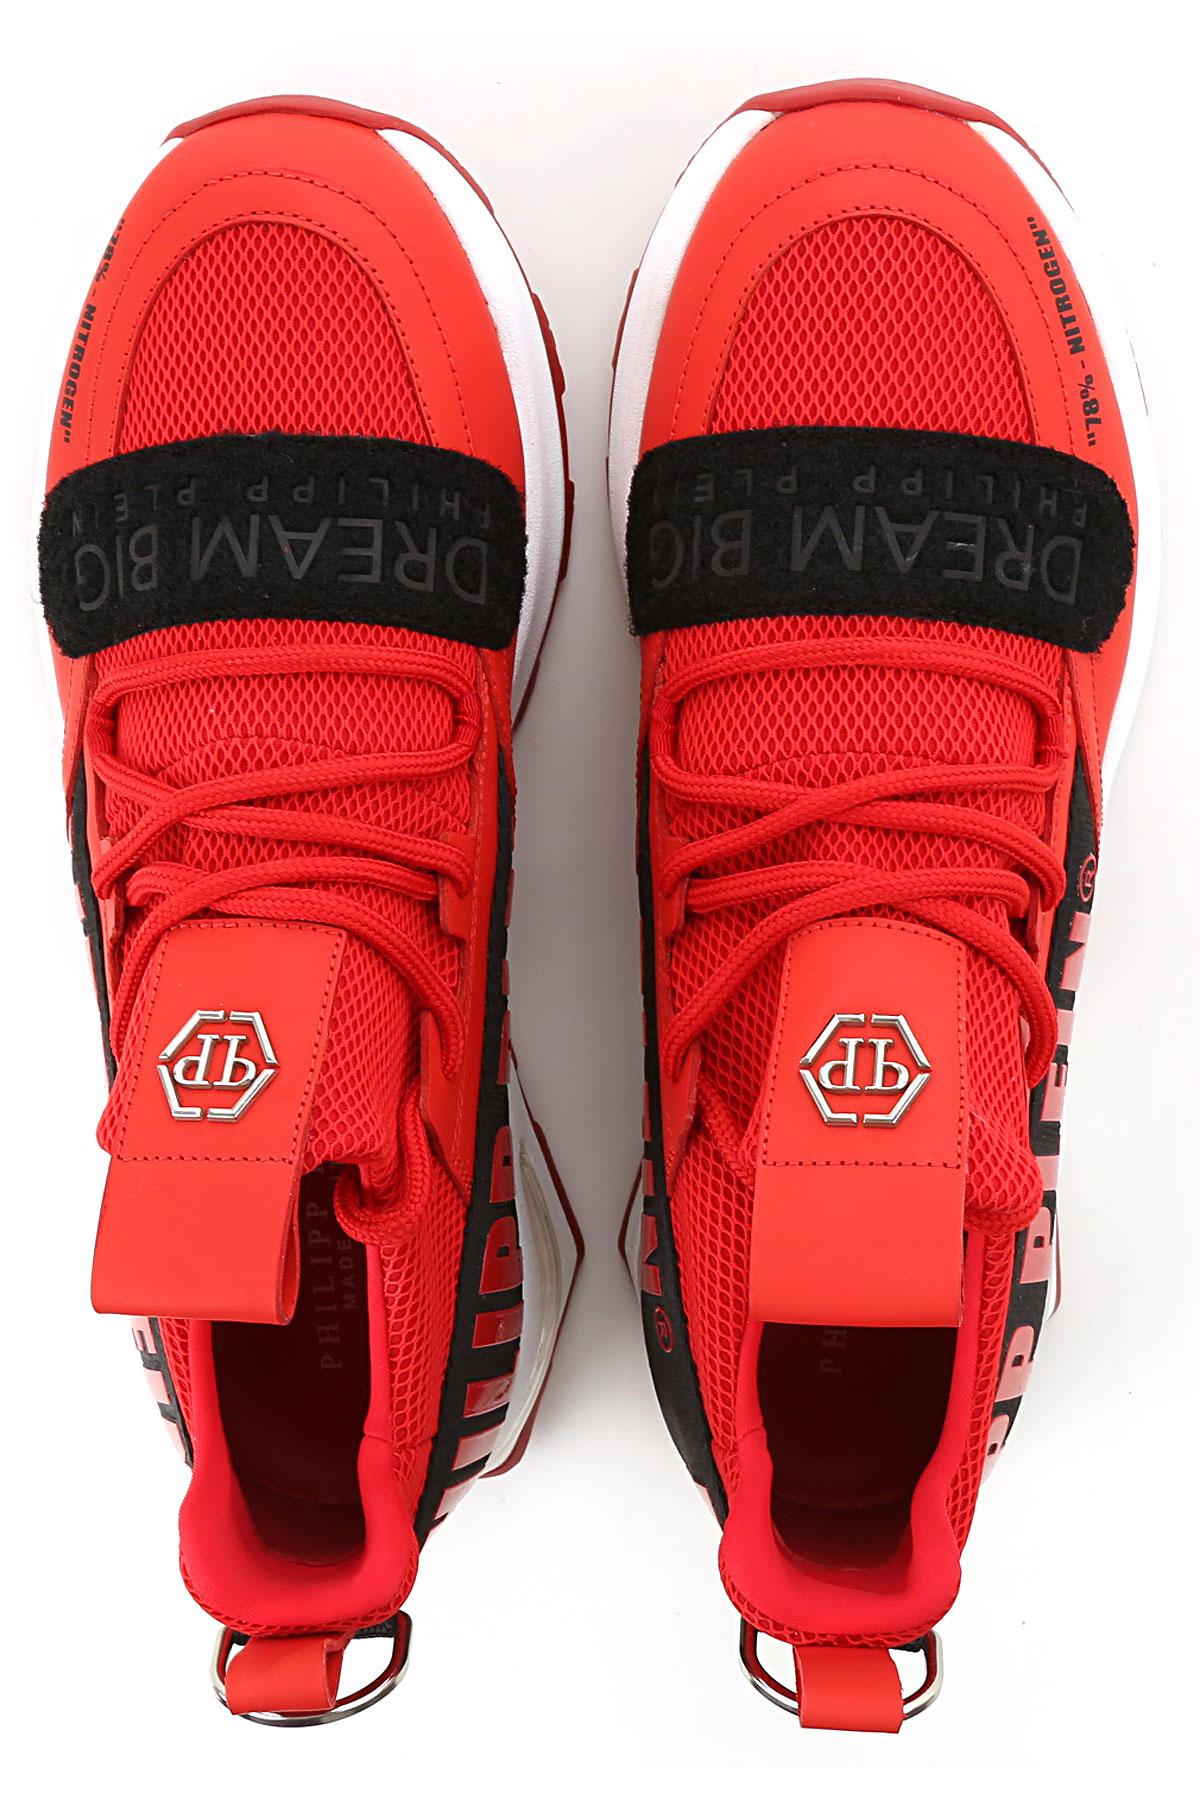 Negro Zapatos Primavera Plein Hombres Para 2019 Rojo Philipp verano 81B7q55